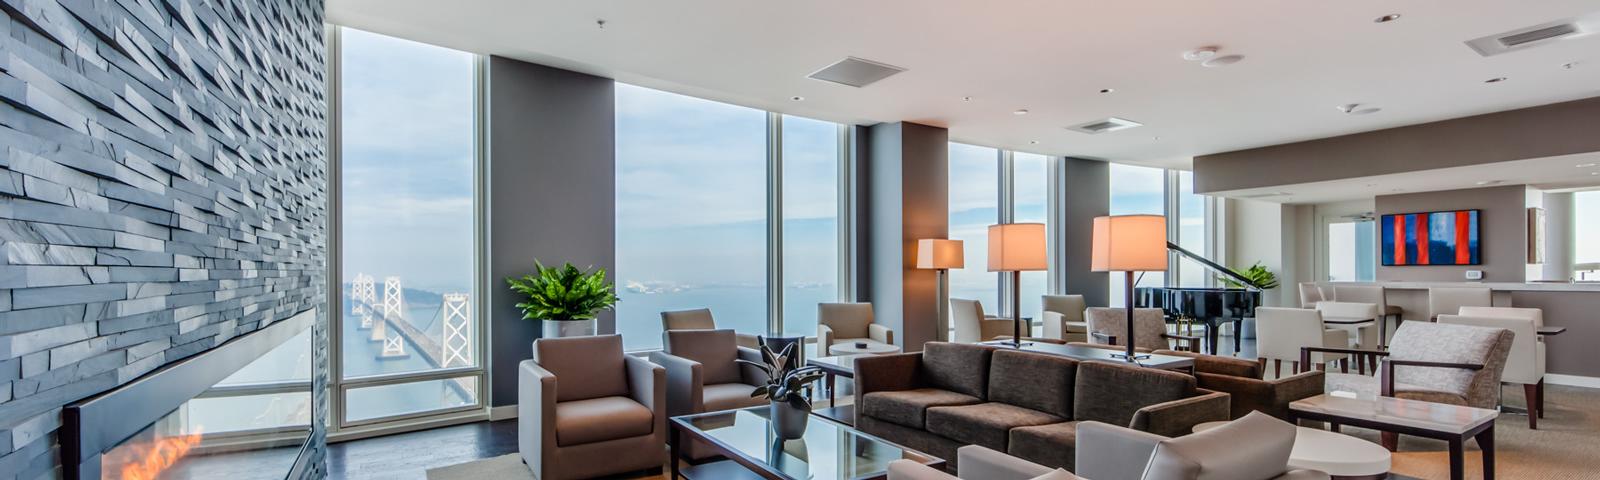 san_francisco_modern_interior